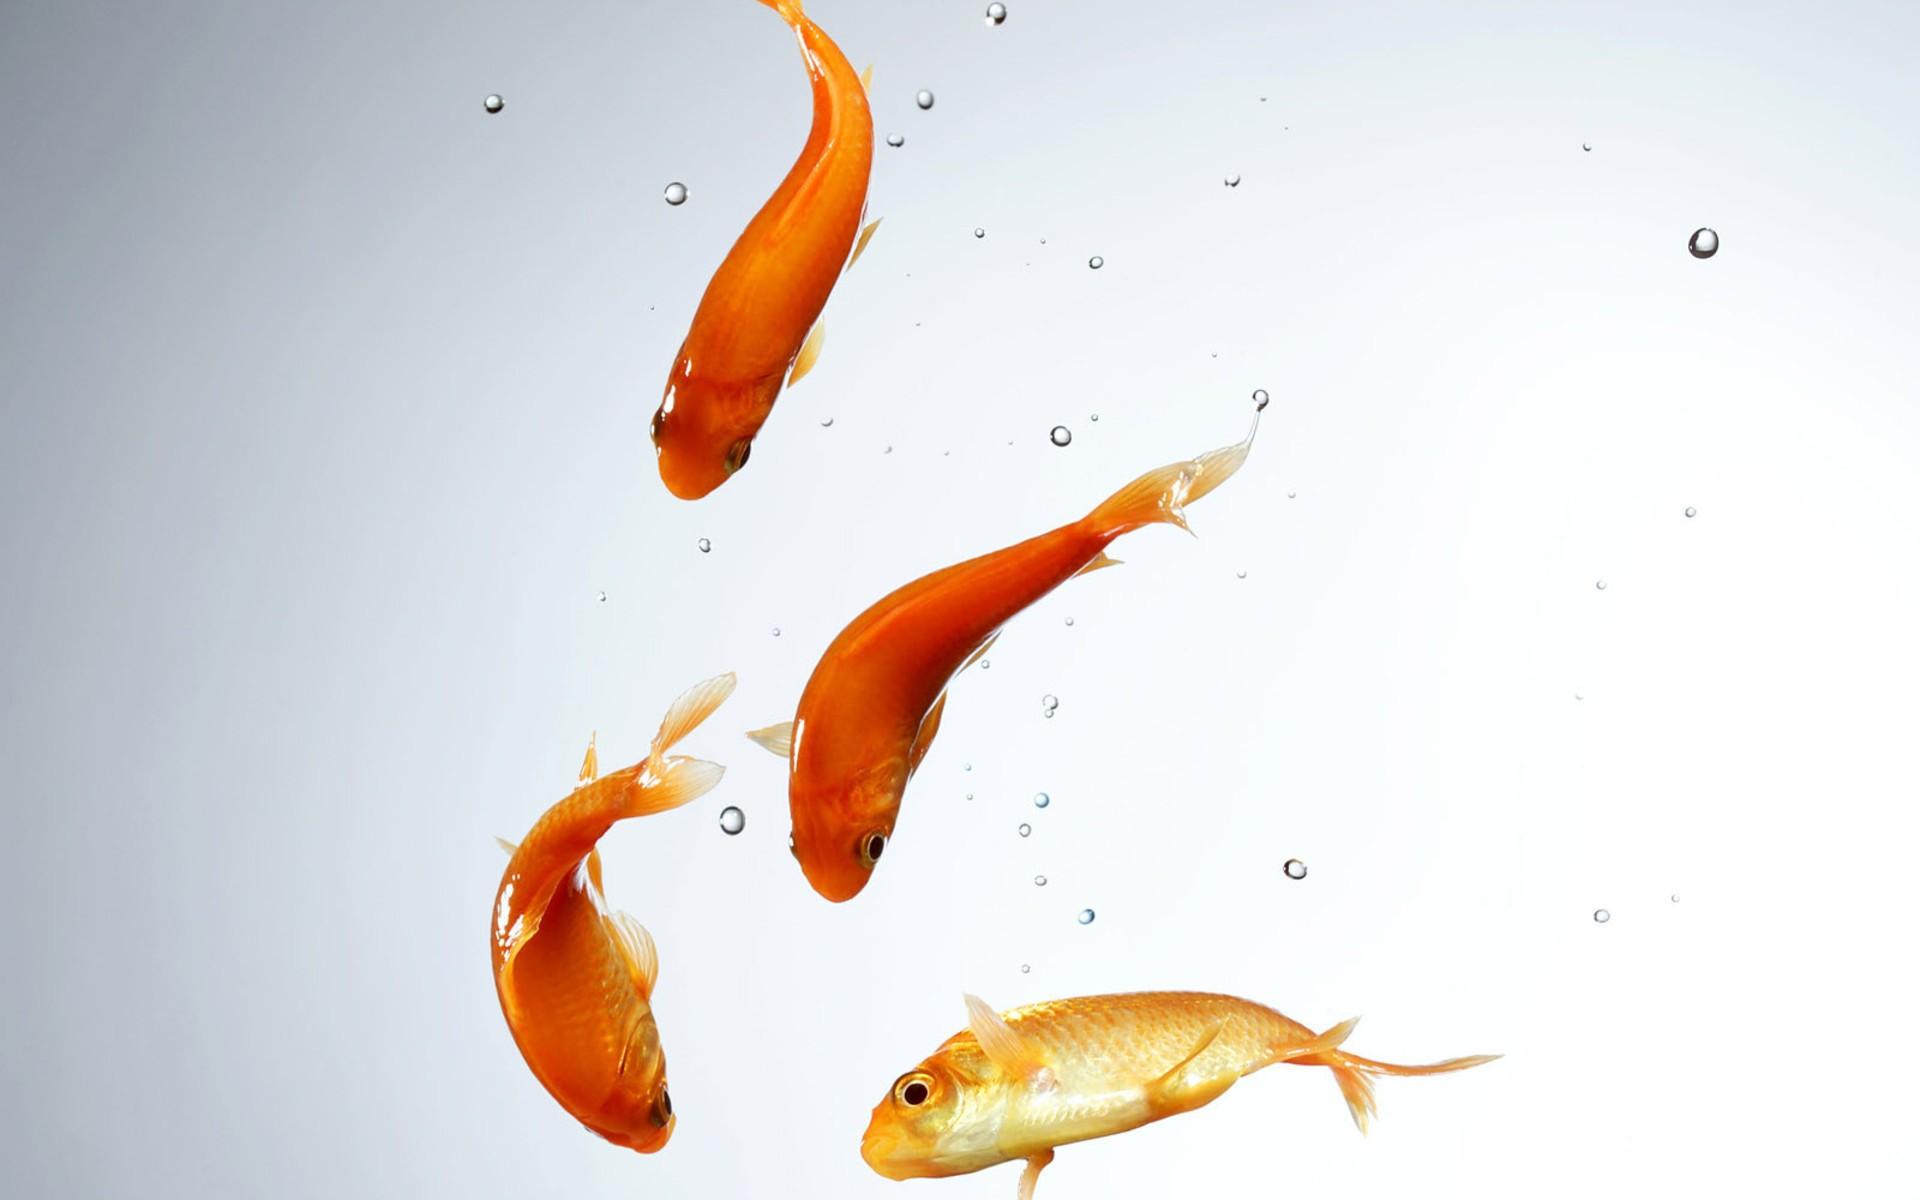 Fish Wallpaper HD - Swimming HD PNG - Fish HD PNG